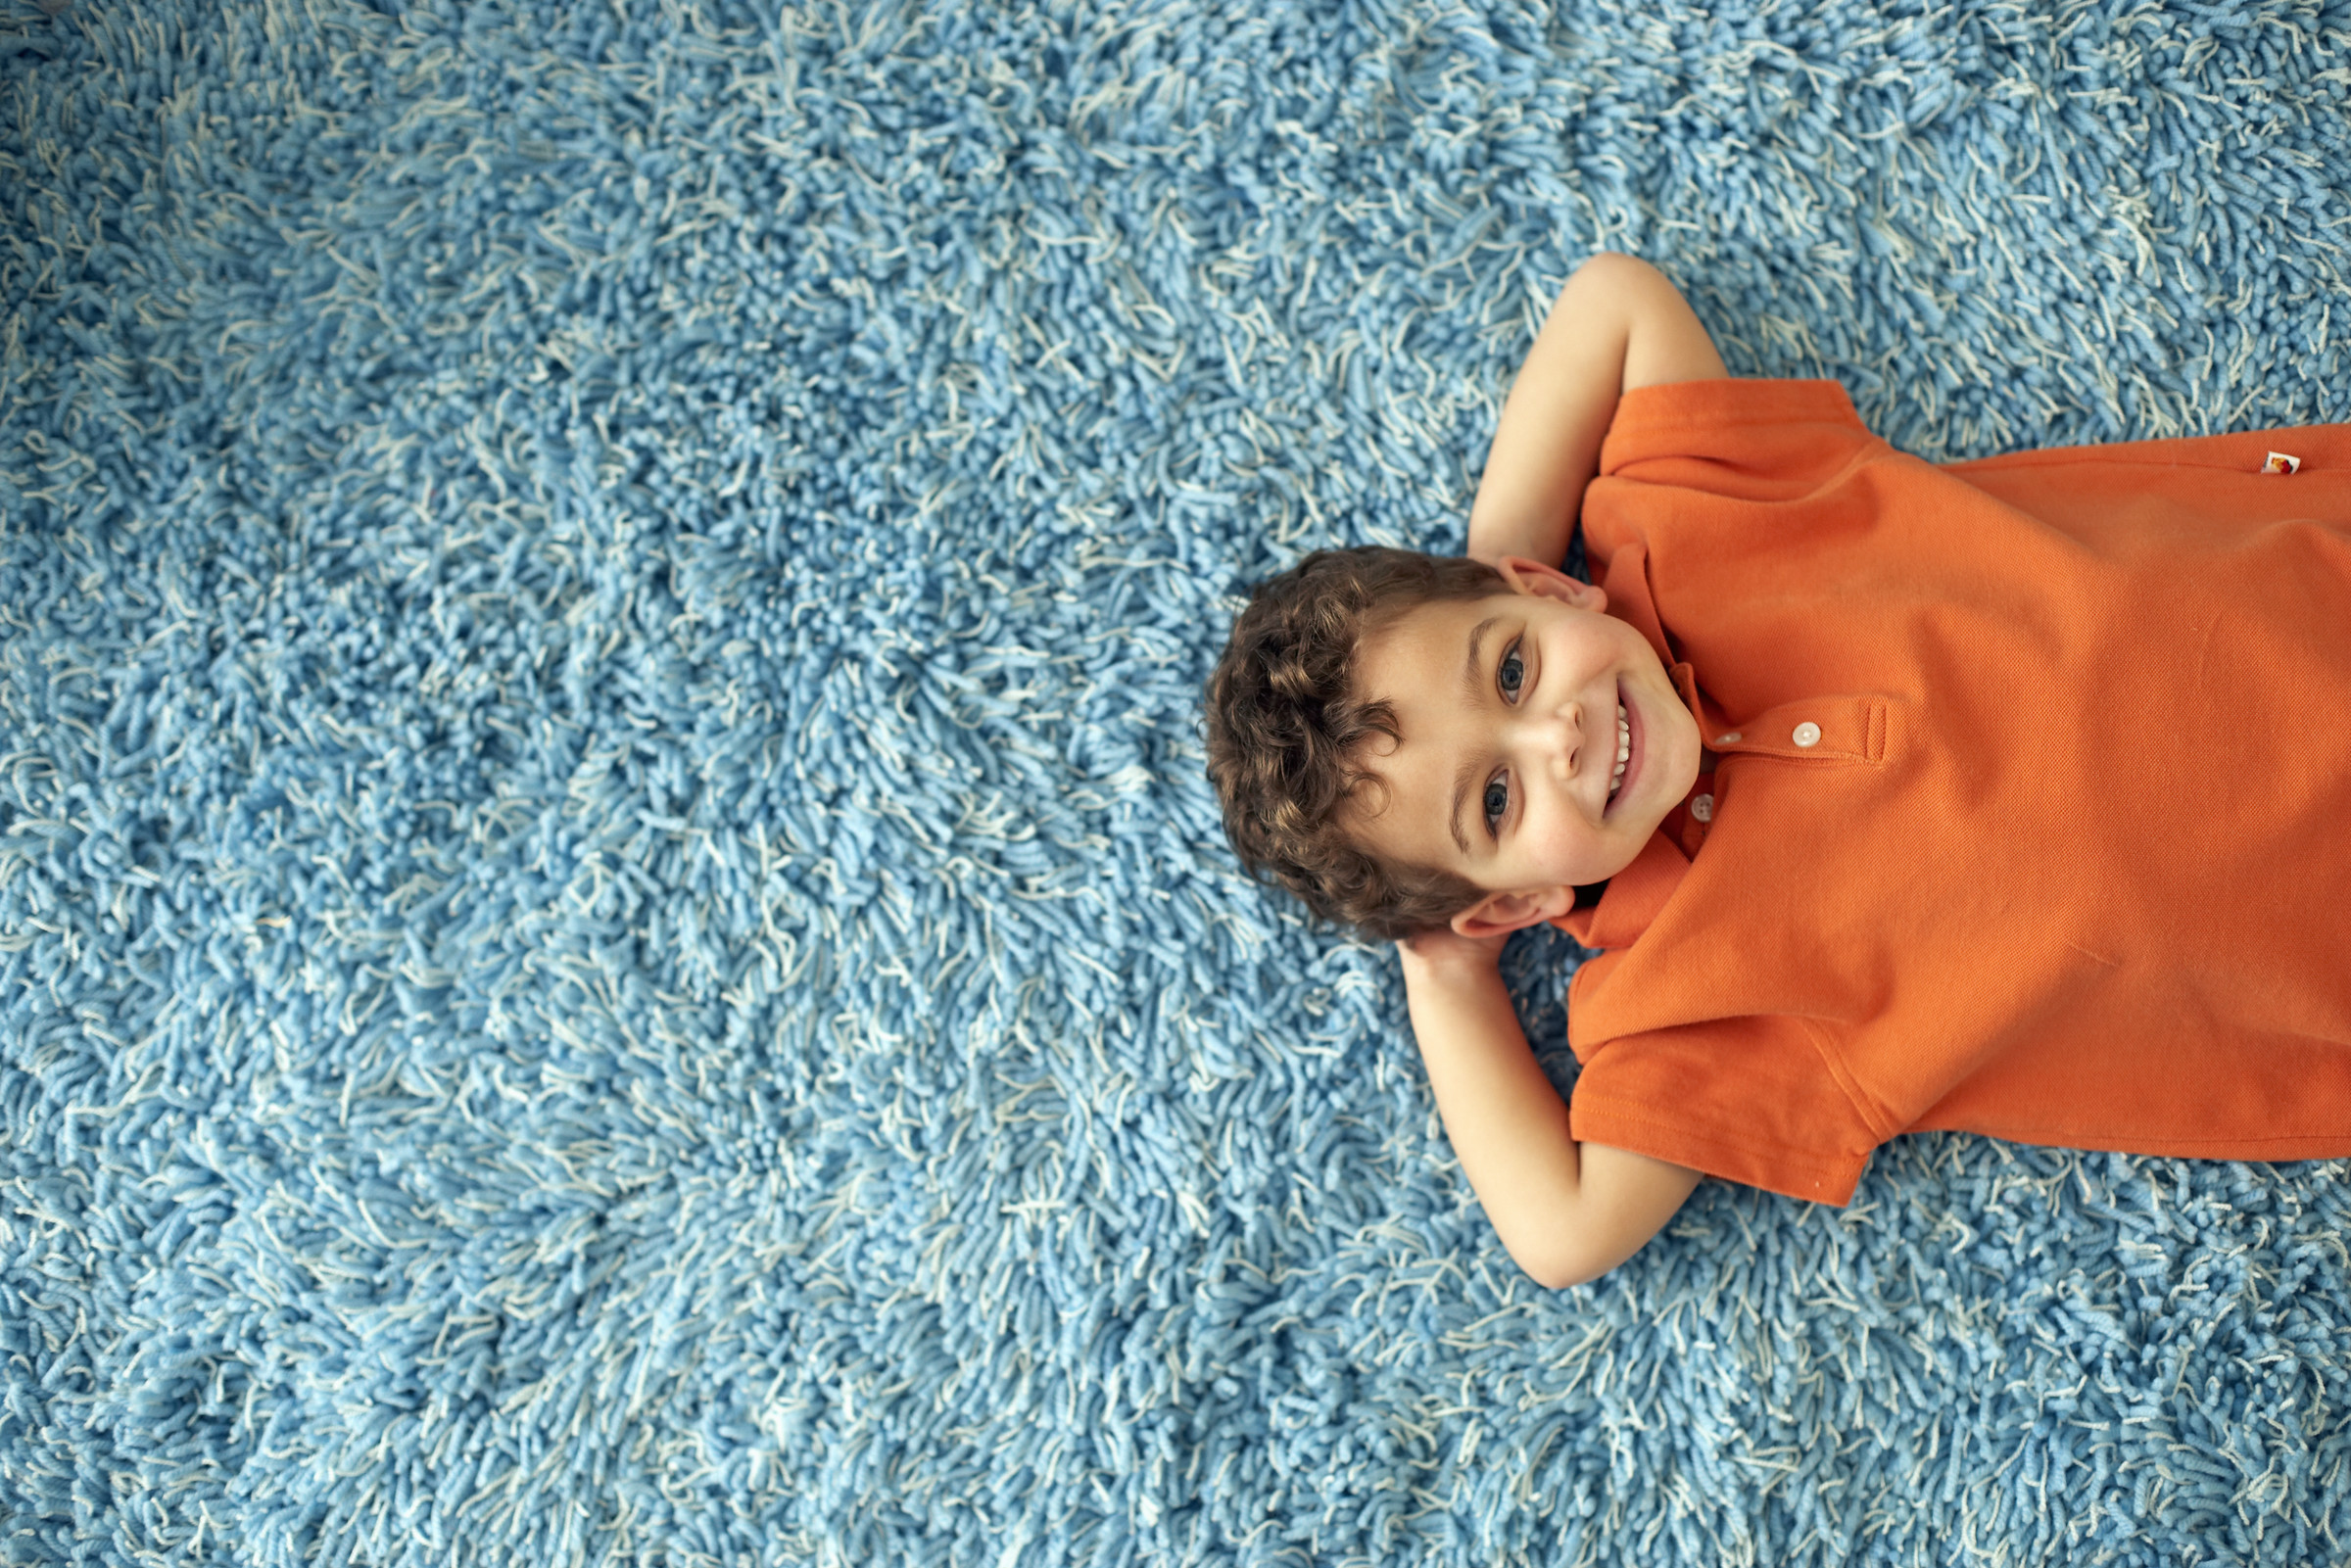 Carpet_and_child